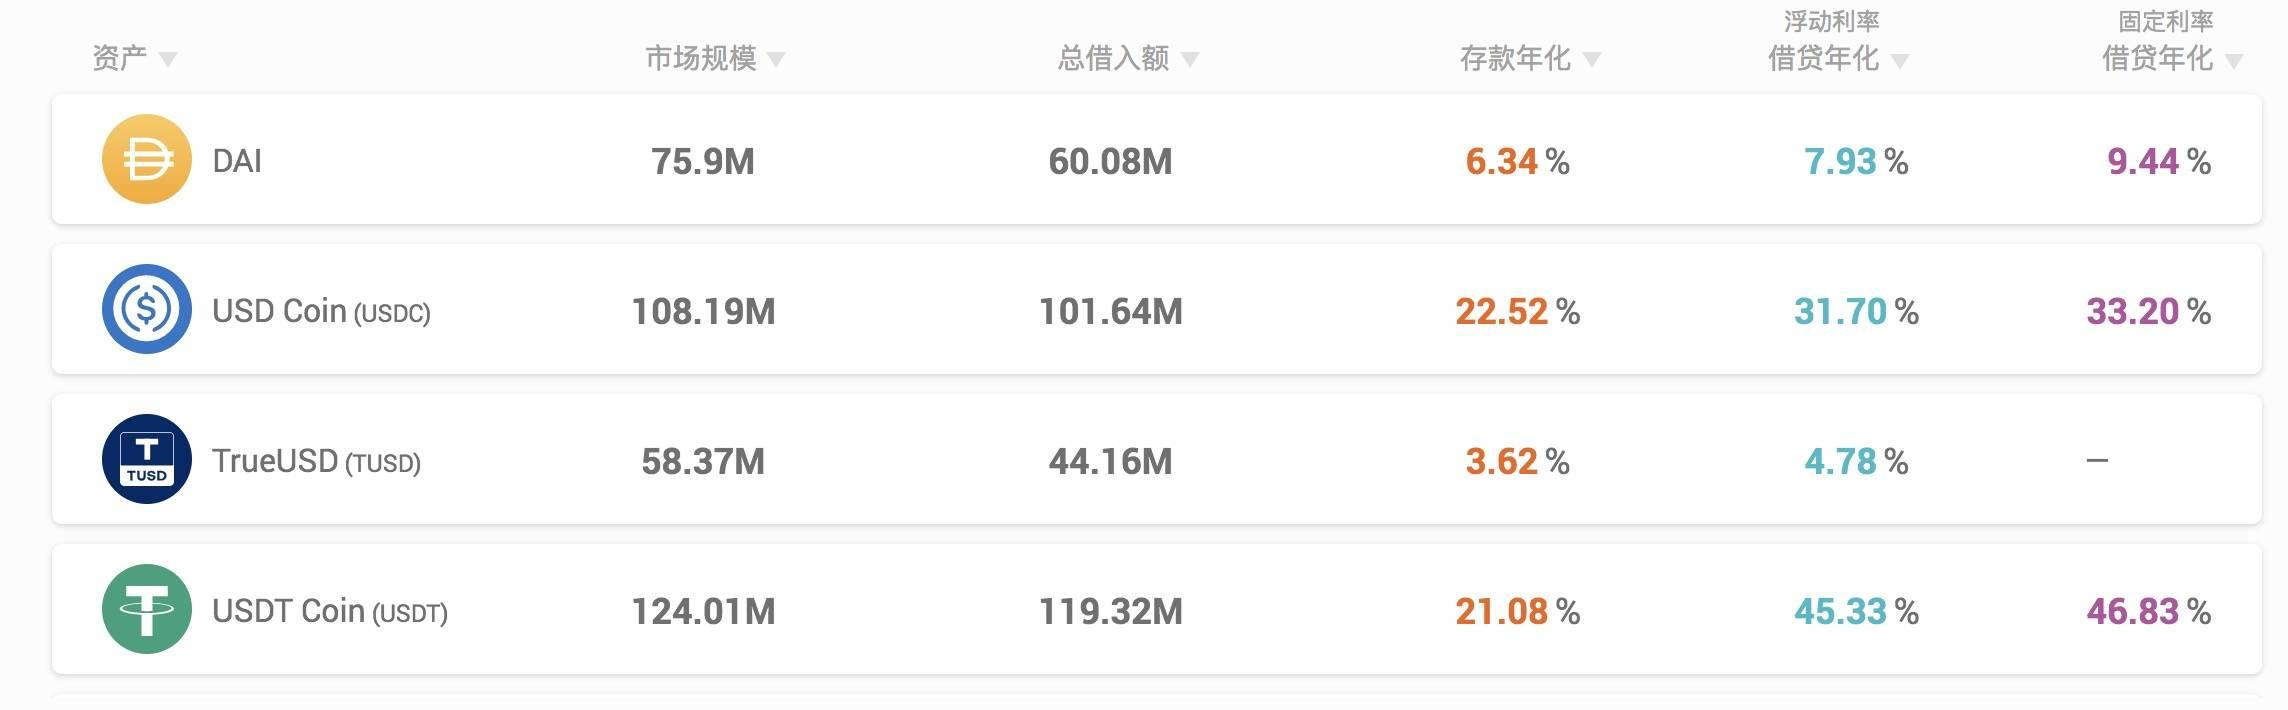 "DeFi之道丨""DeFi蓝筹股""数据一览:Uniswap日交易量破10亿美元,YFI锁仓量下滑明显"